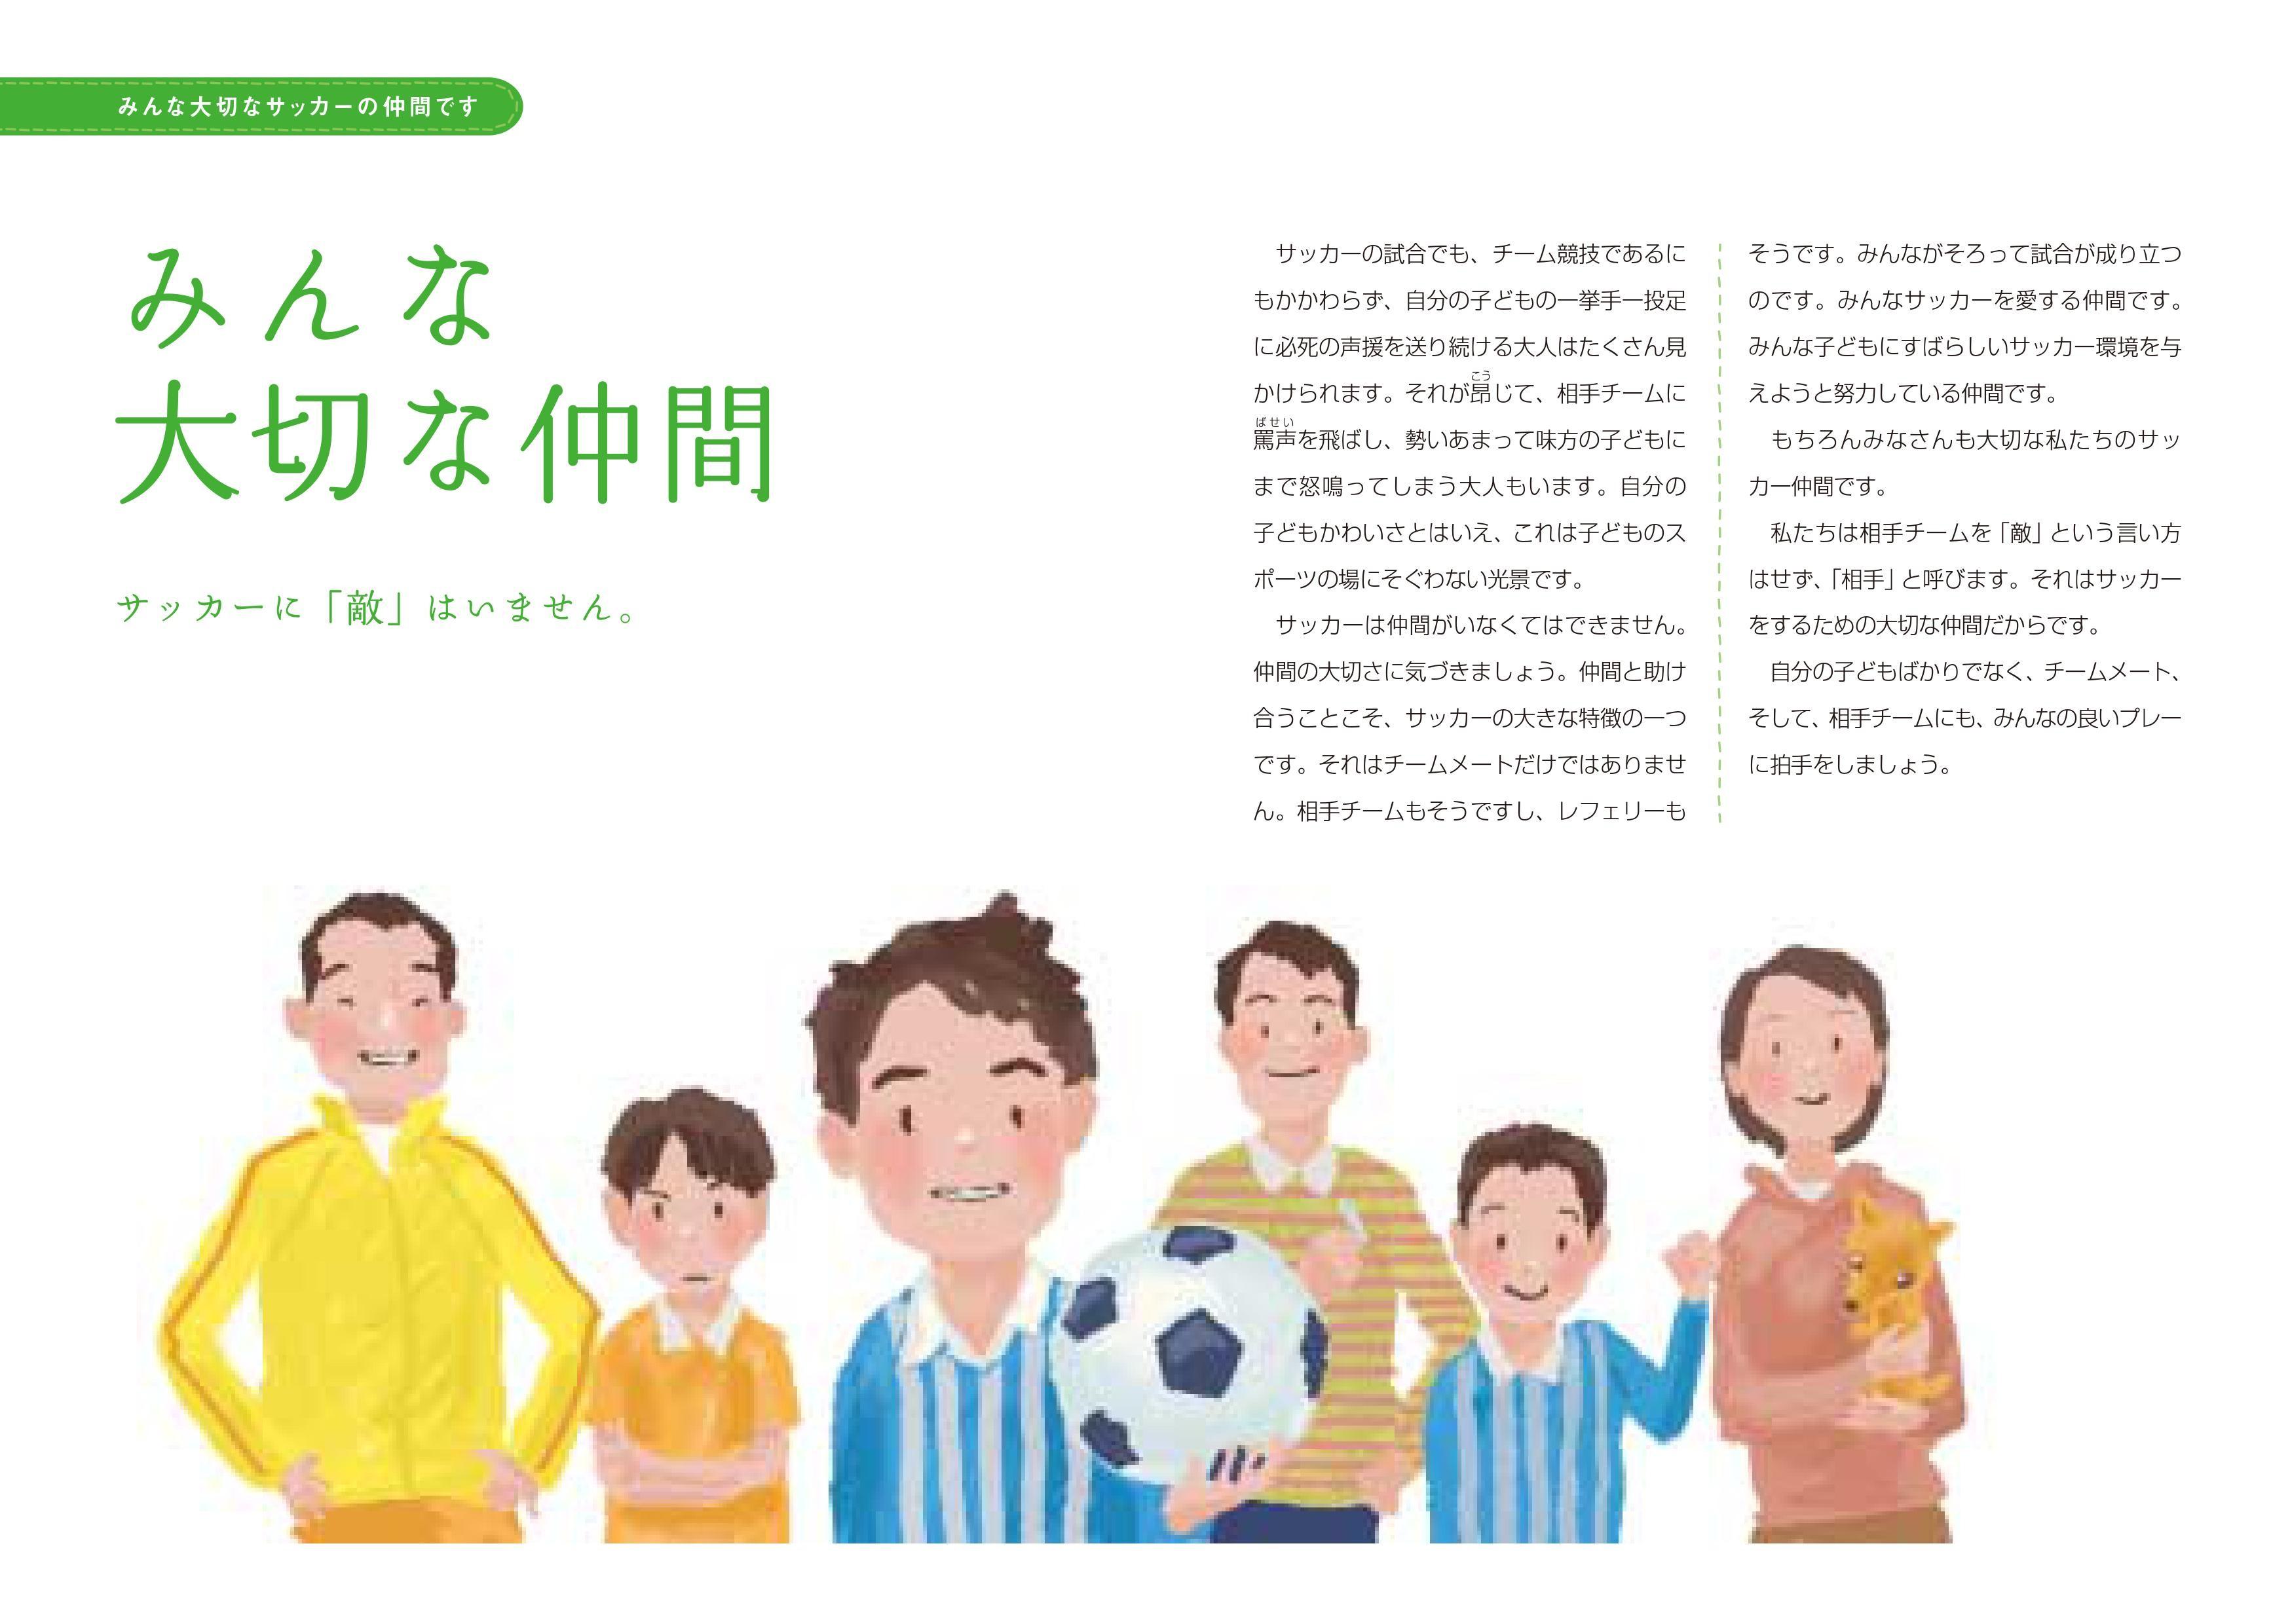 JFA handbook _10